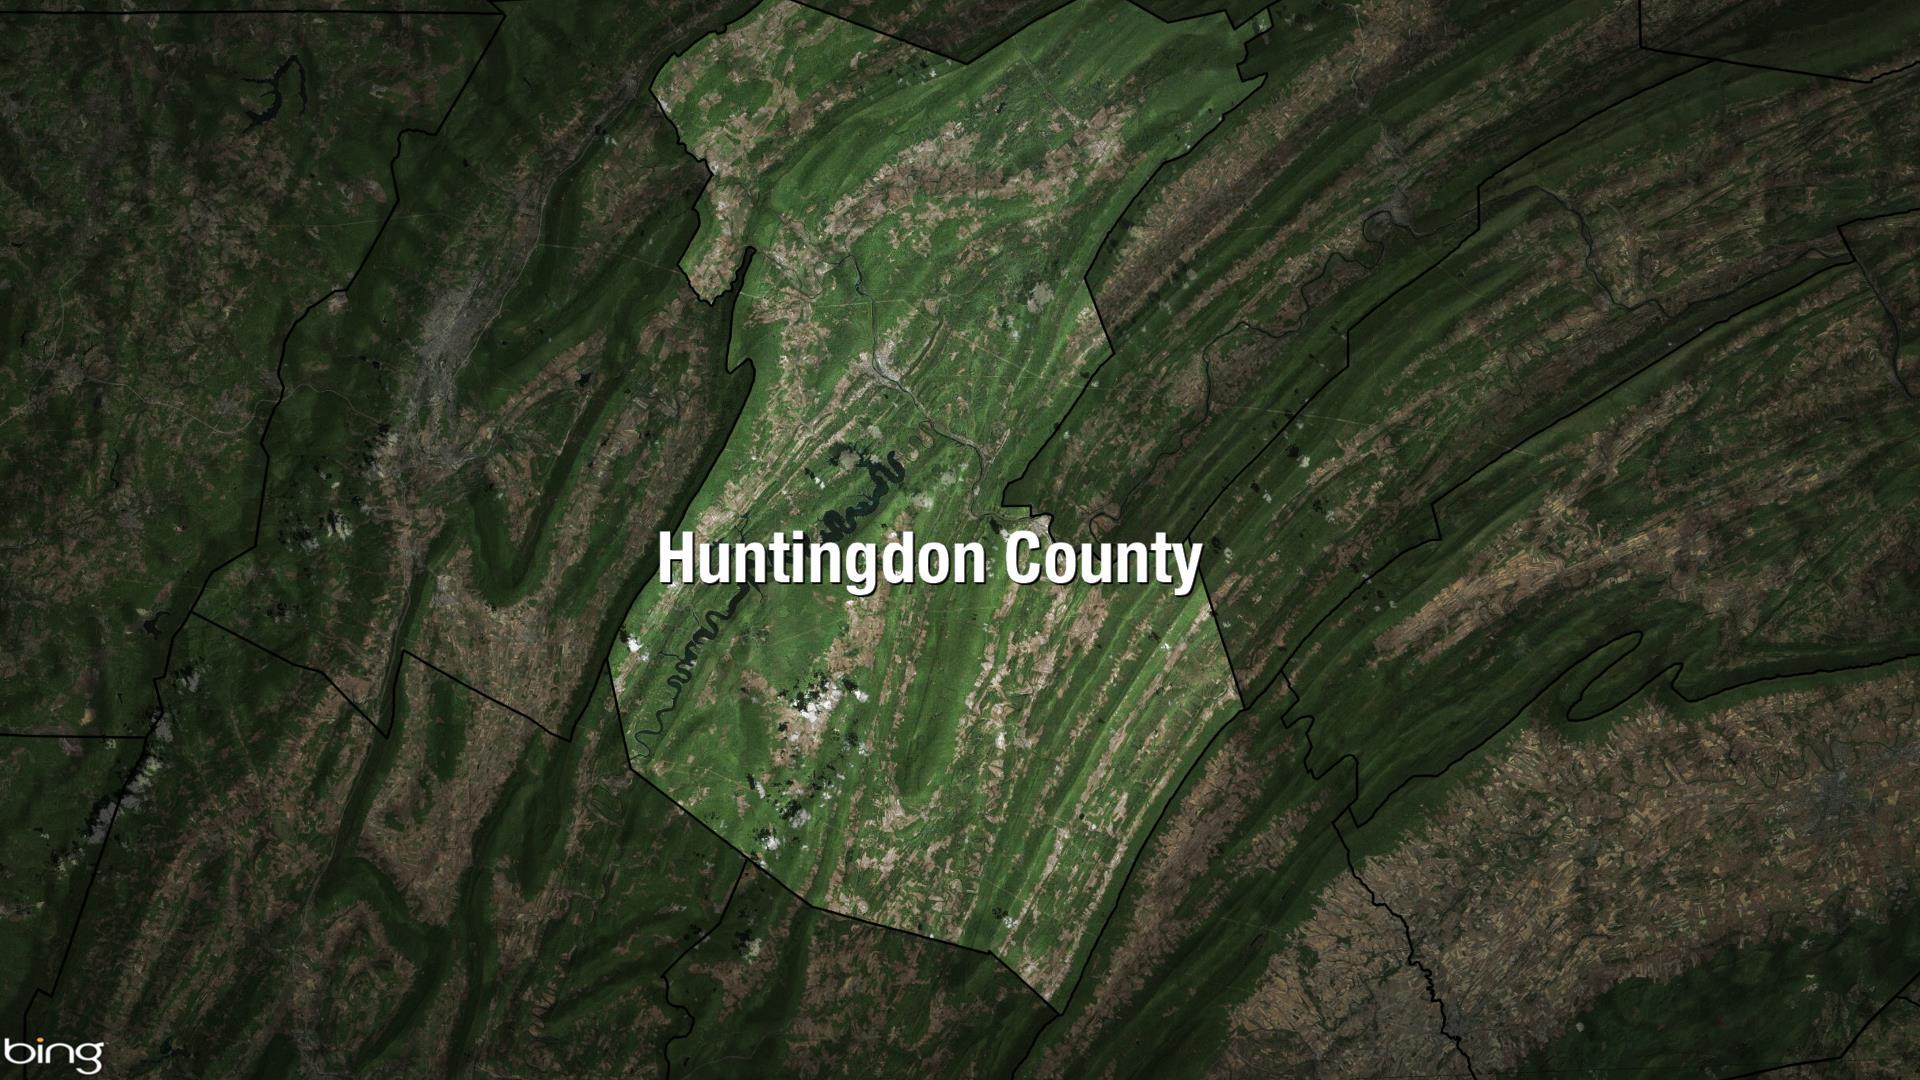 Huntingdon County Map_1508817181220.jpg